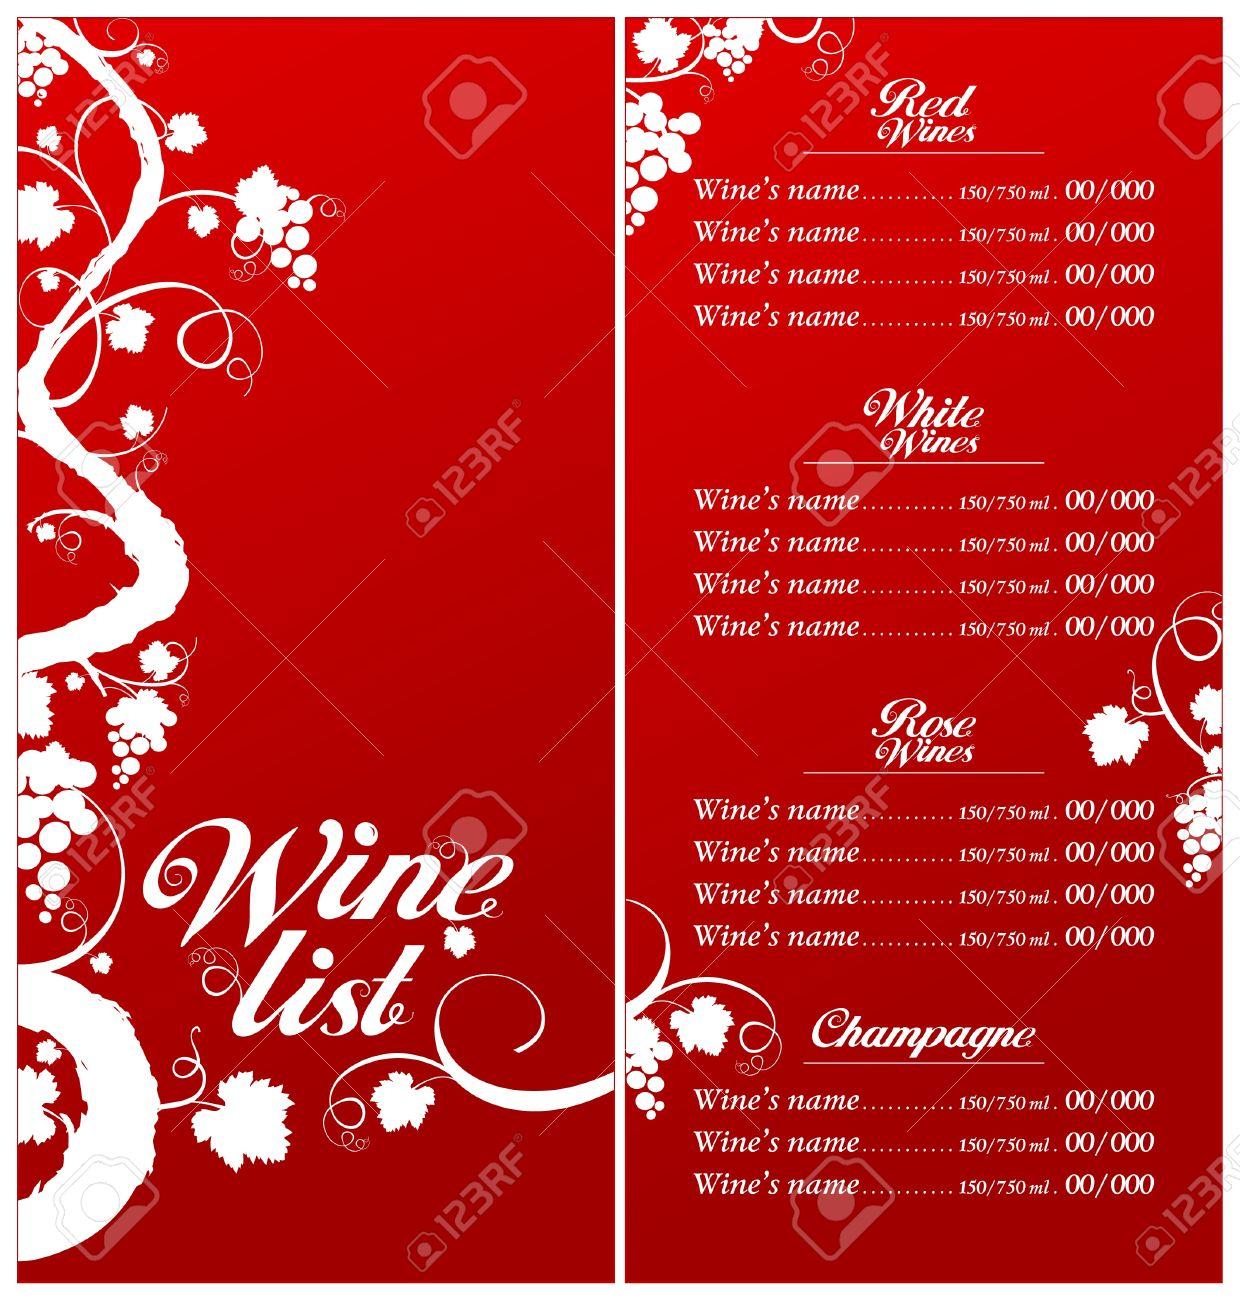 Wine List Menu Card Design Template. Royalty Free Cliparts ...